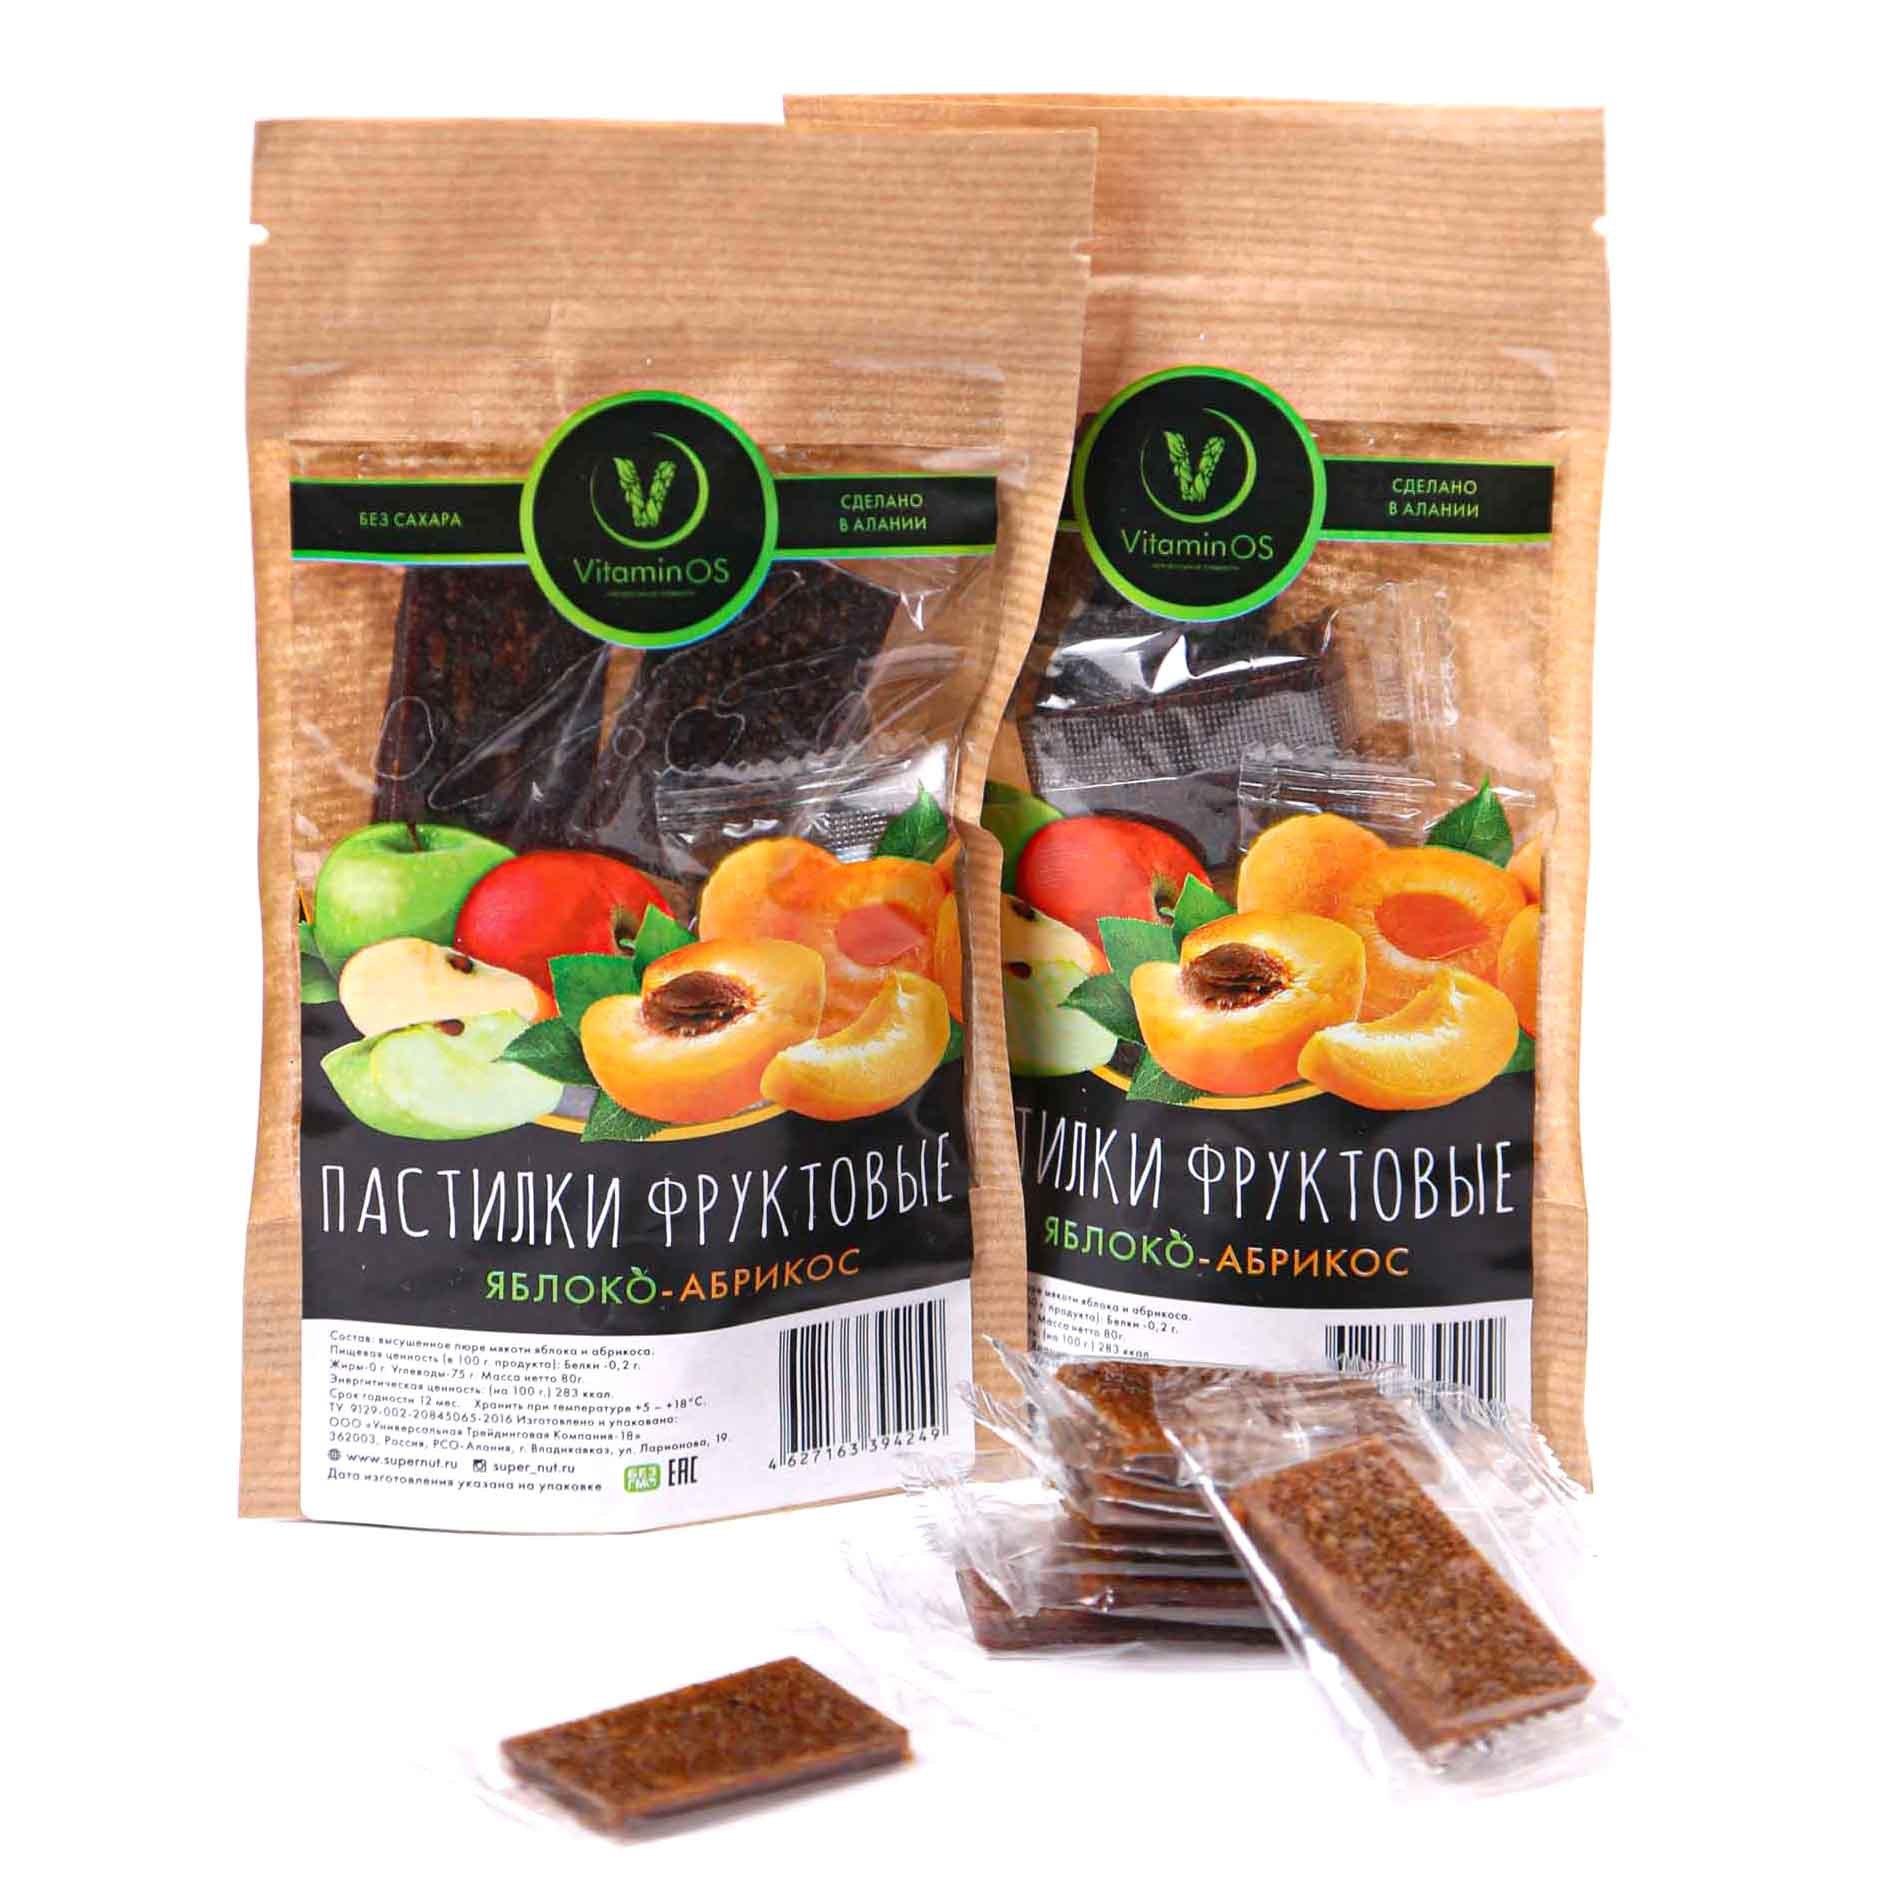 Сухофрукты Пастила Vitaminos с абрикосом и яблоком, Supernut, 80г import_files_40_40cc0fa968e411eaa9c7484d7ecee297_7e34d5af69ad11eaa9c7484d7ecee297.jpg